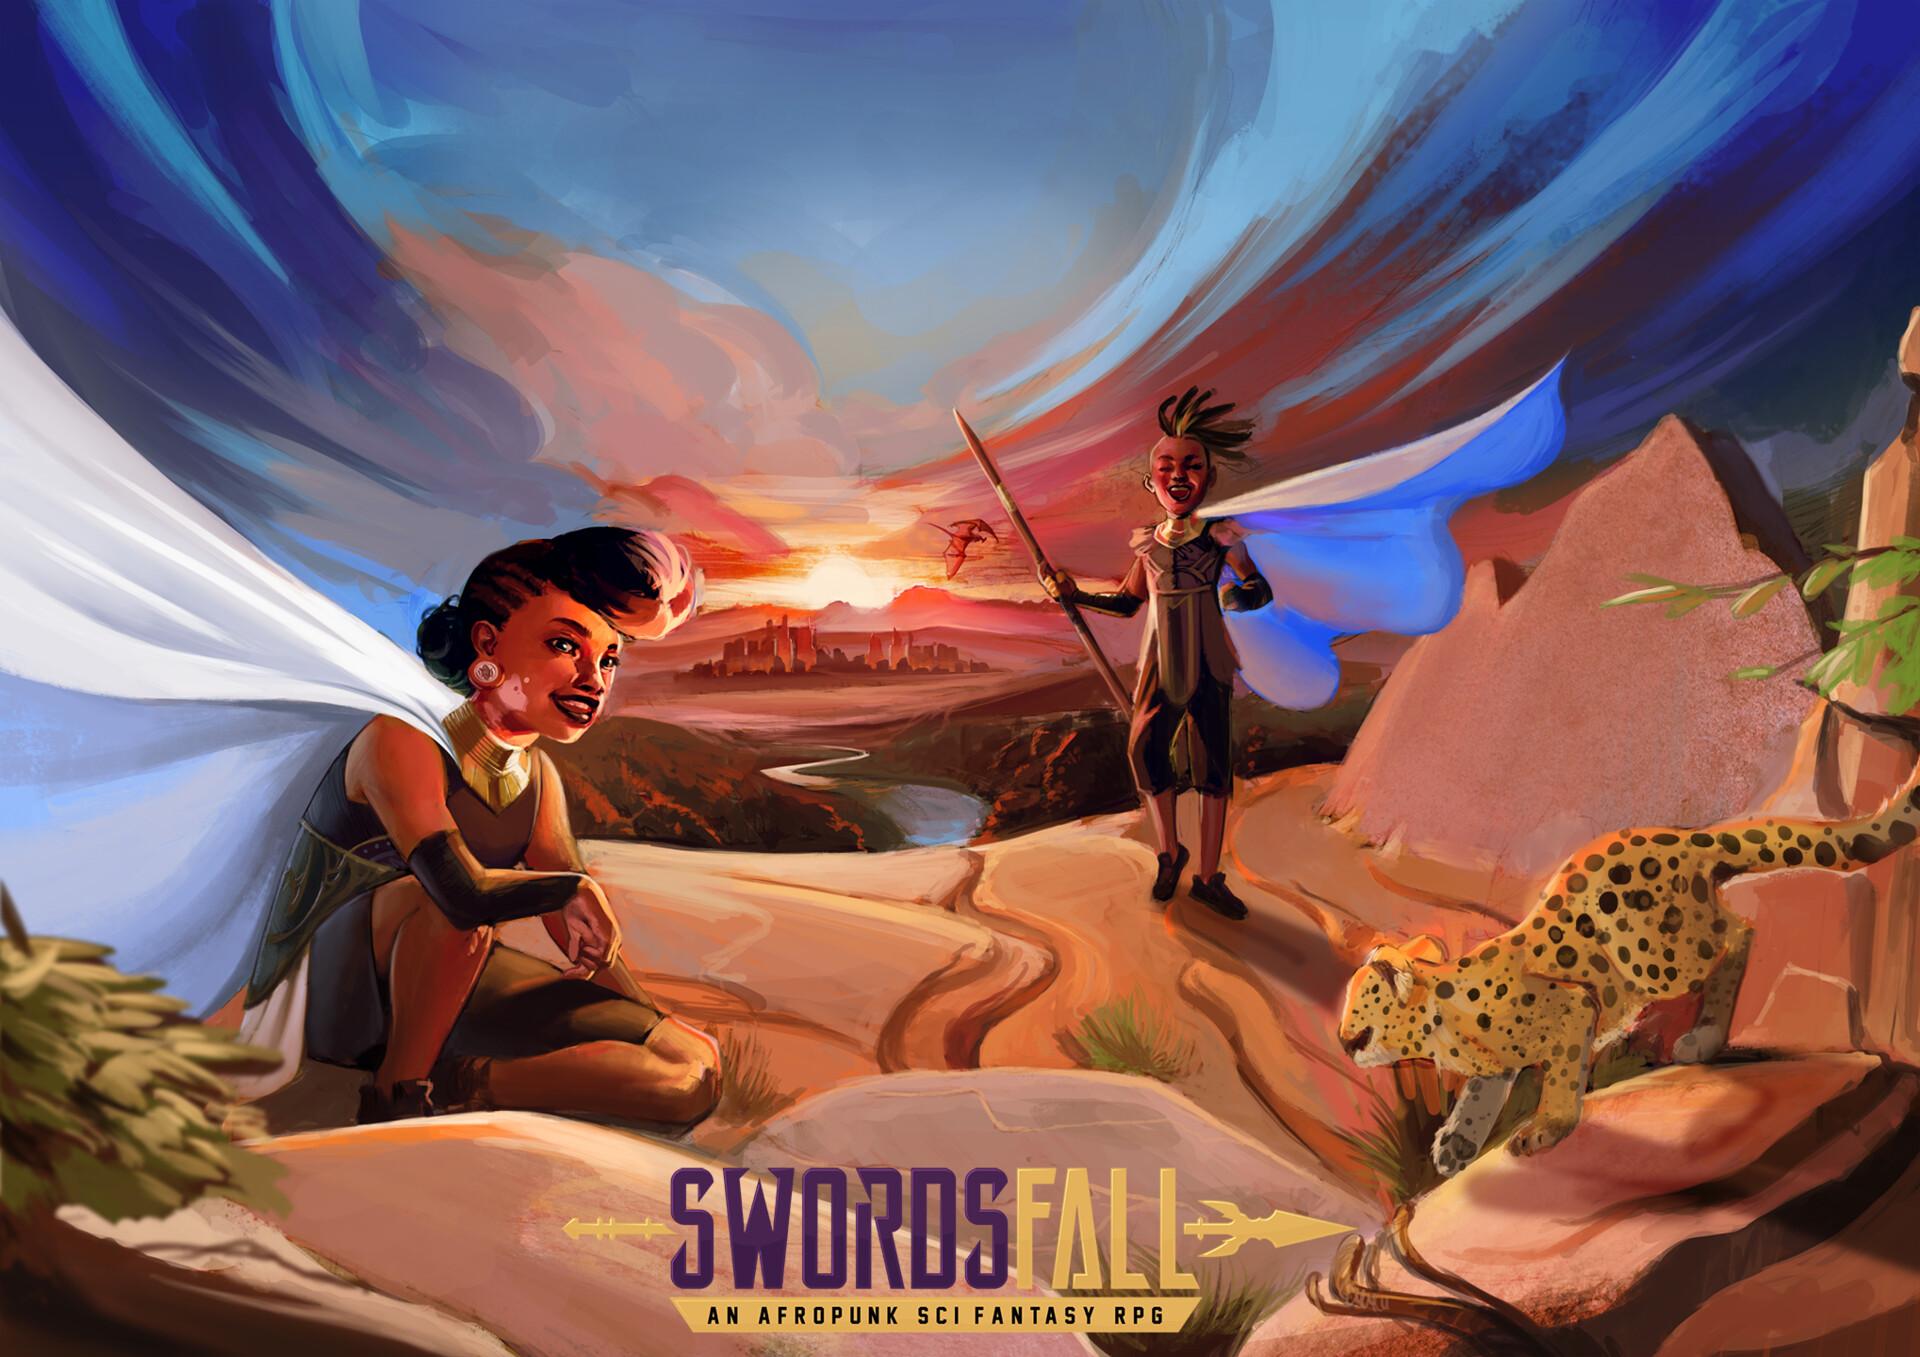 Tumo mere promo art swordsfall logo